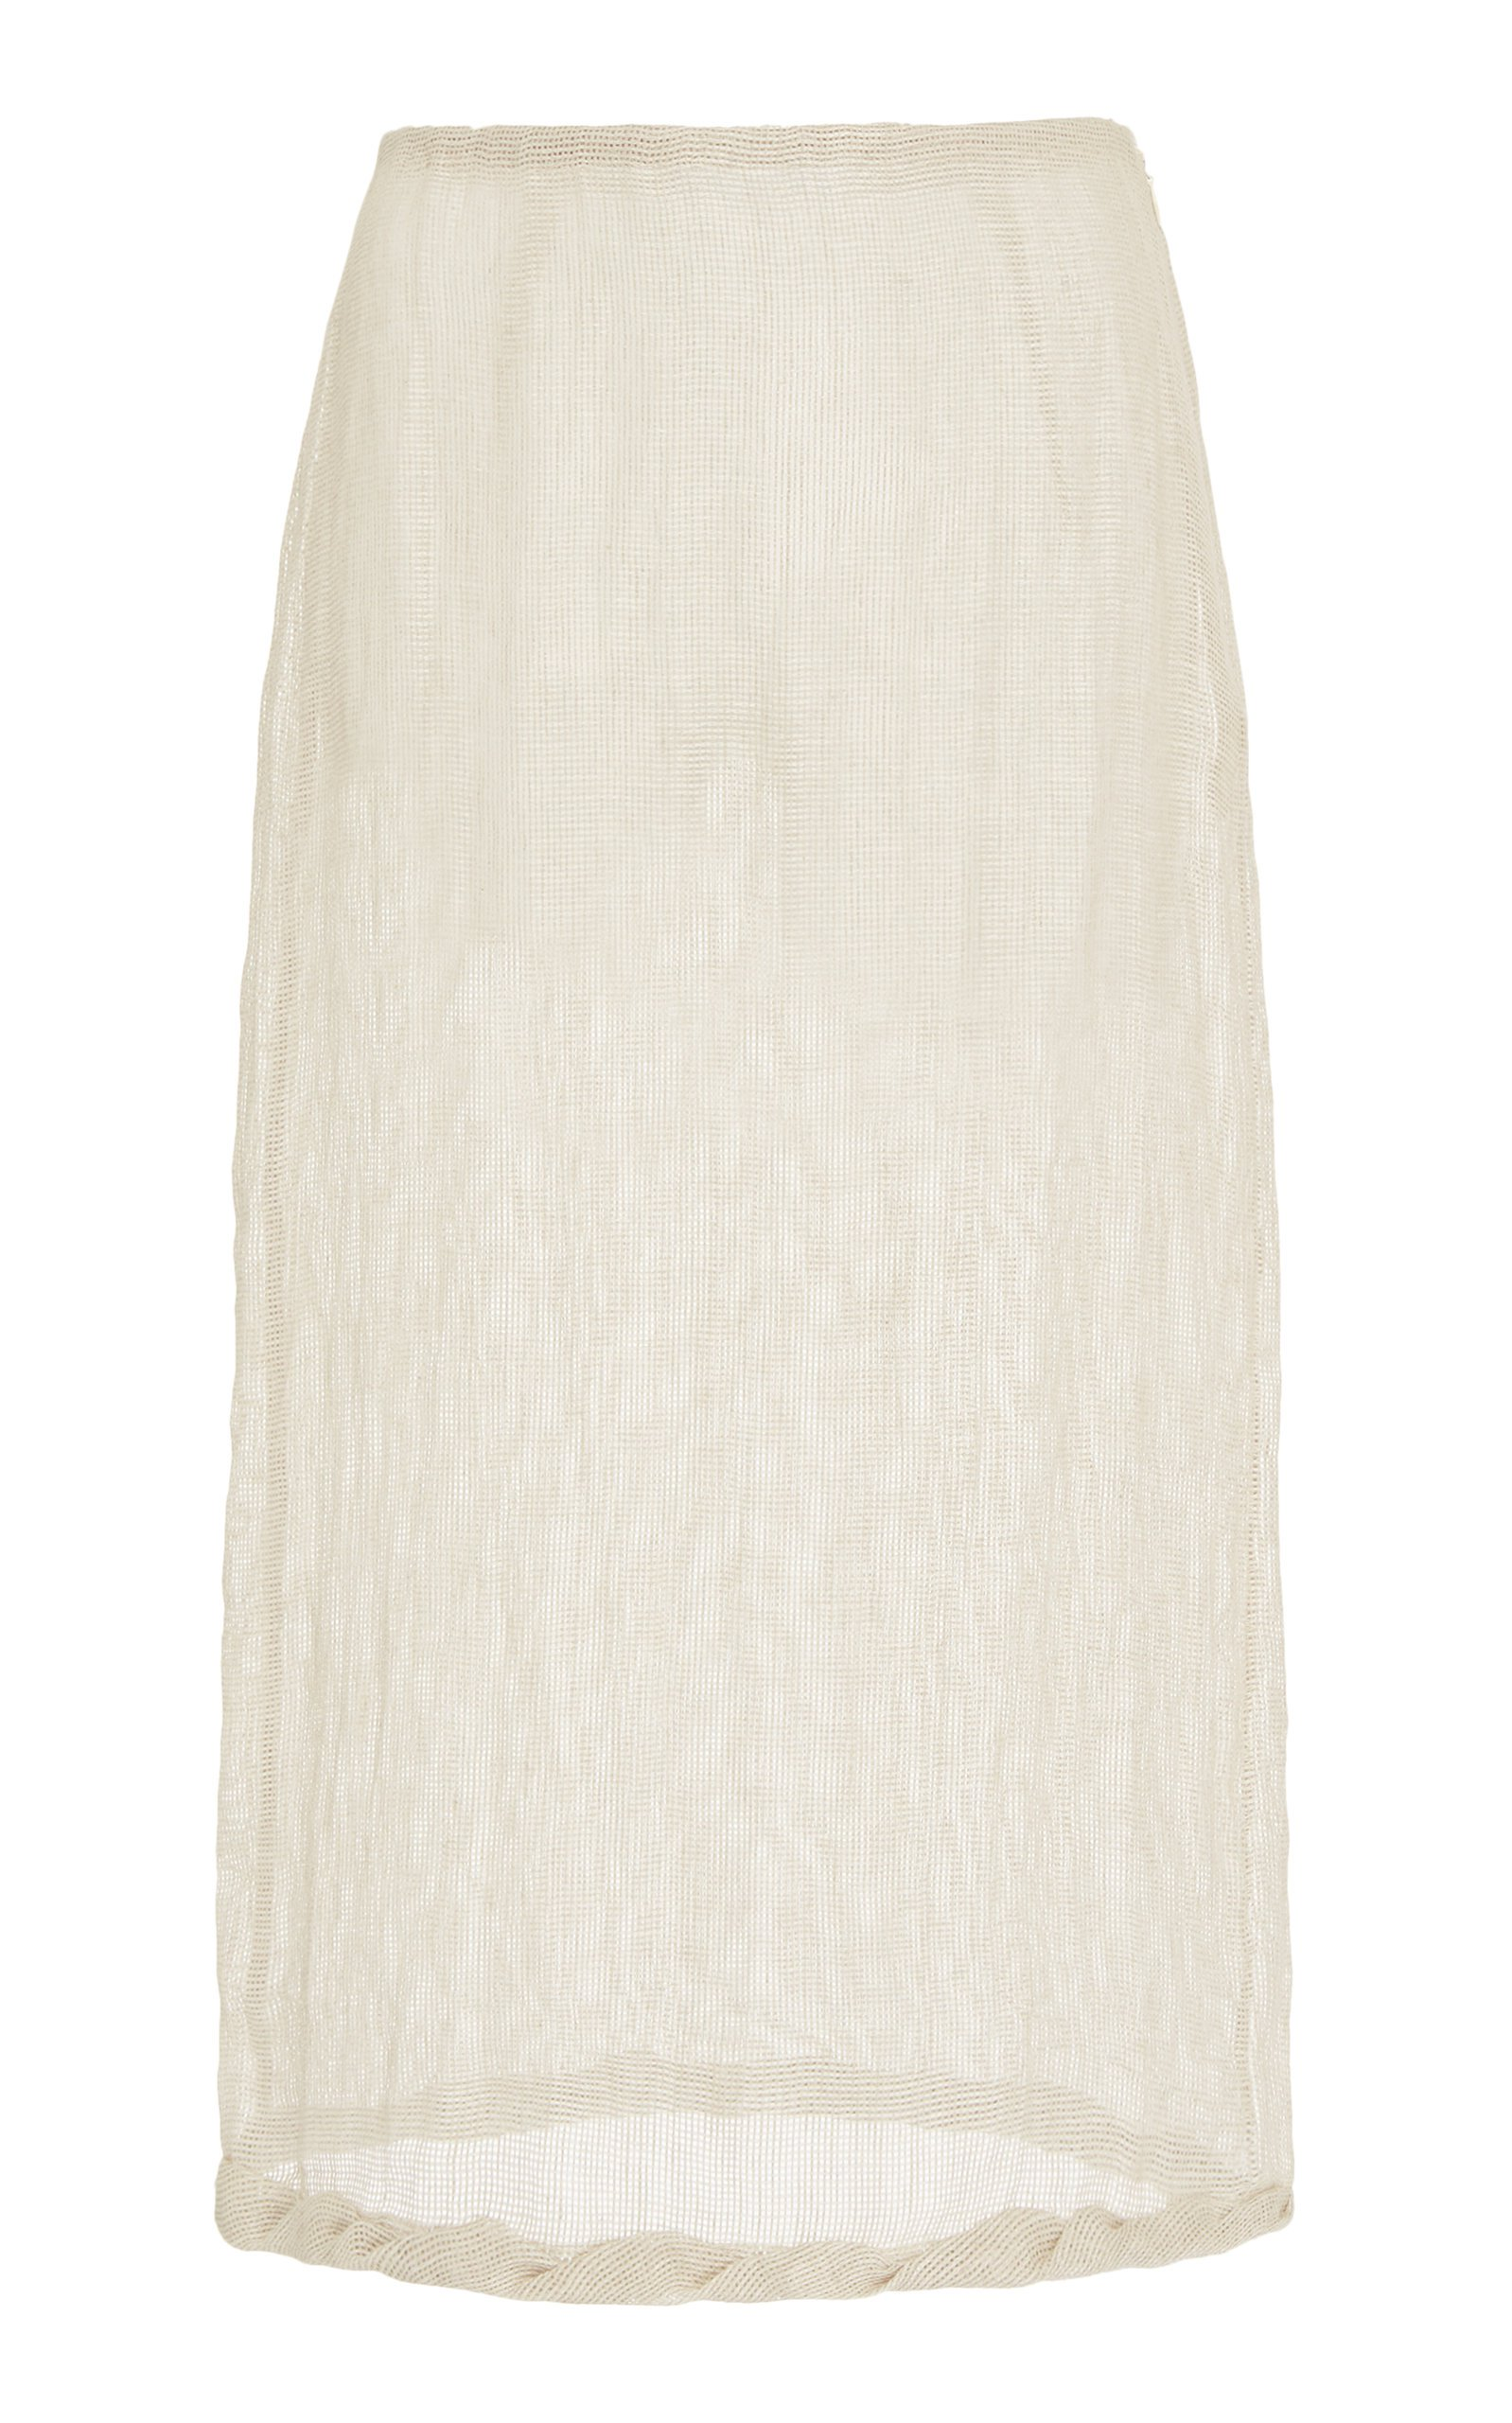 Rejina Pyo Dani Linen Voile Pencil Skirt Size: 14